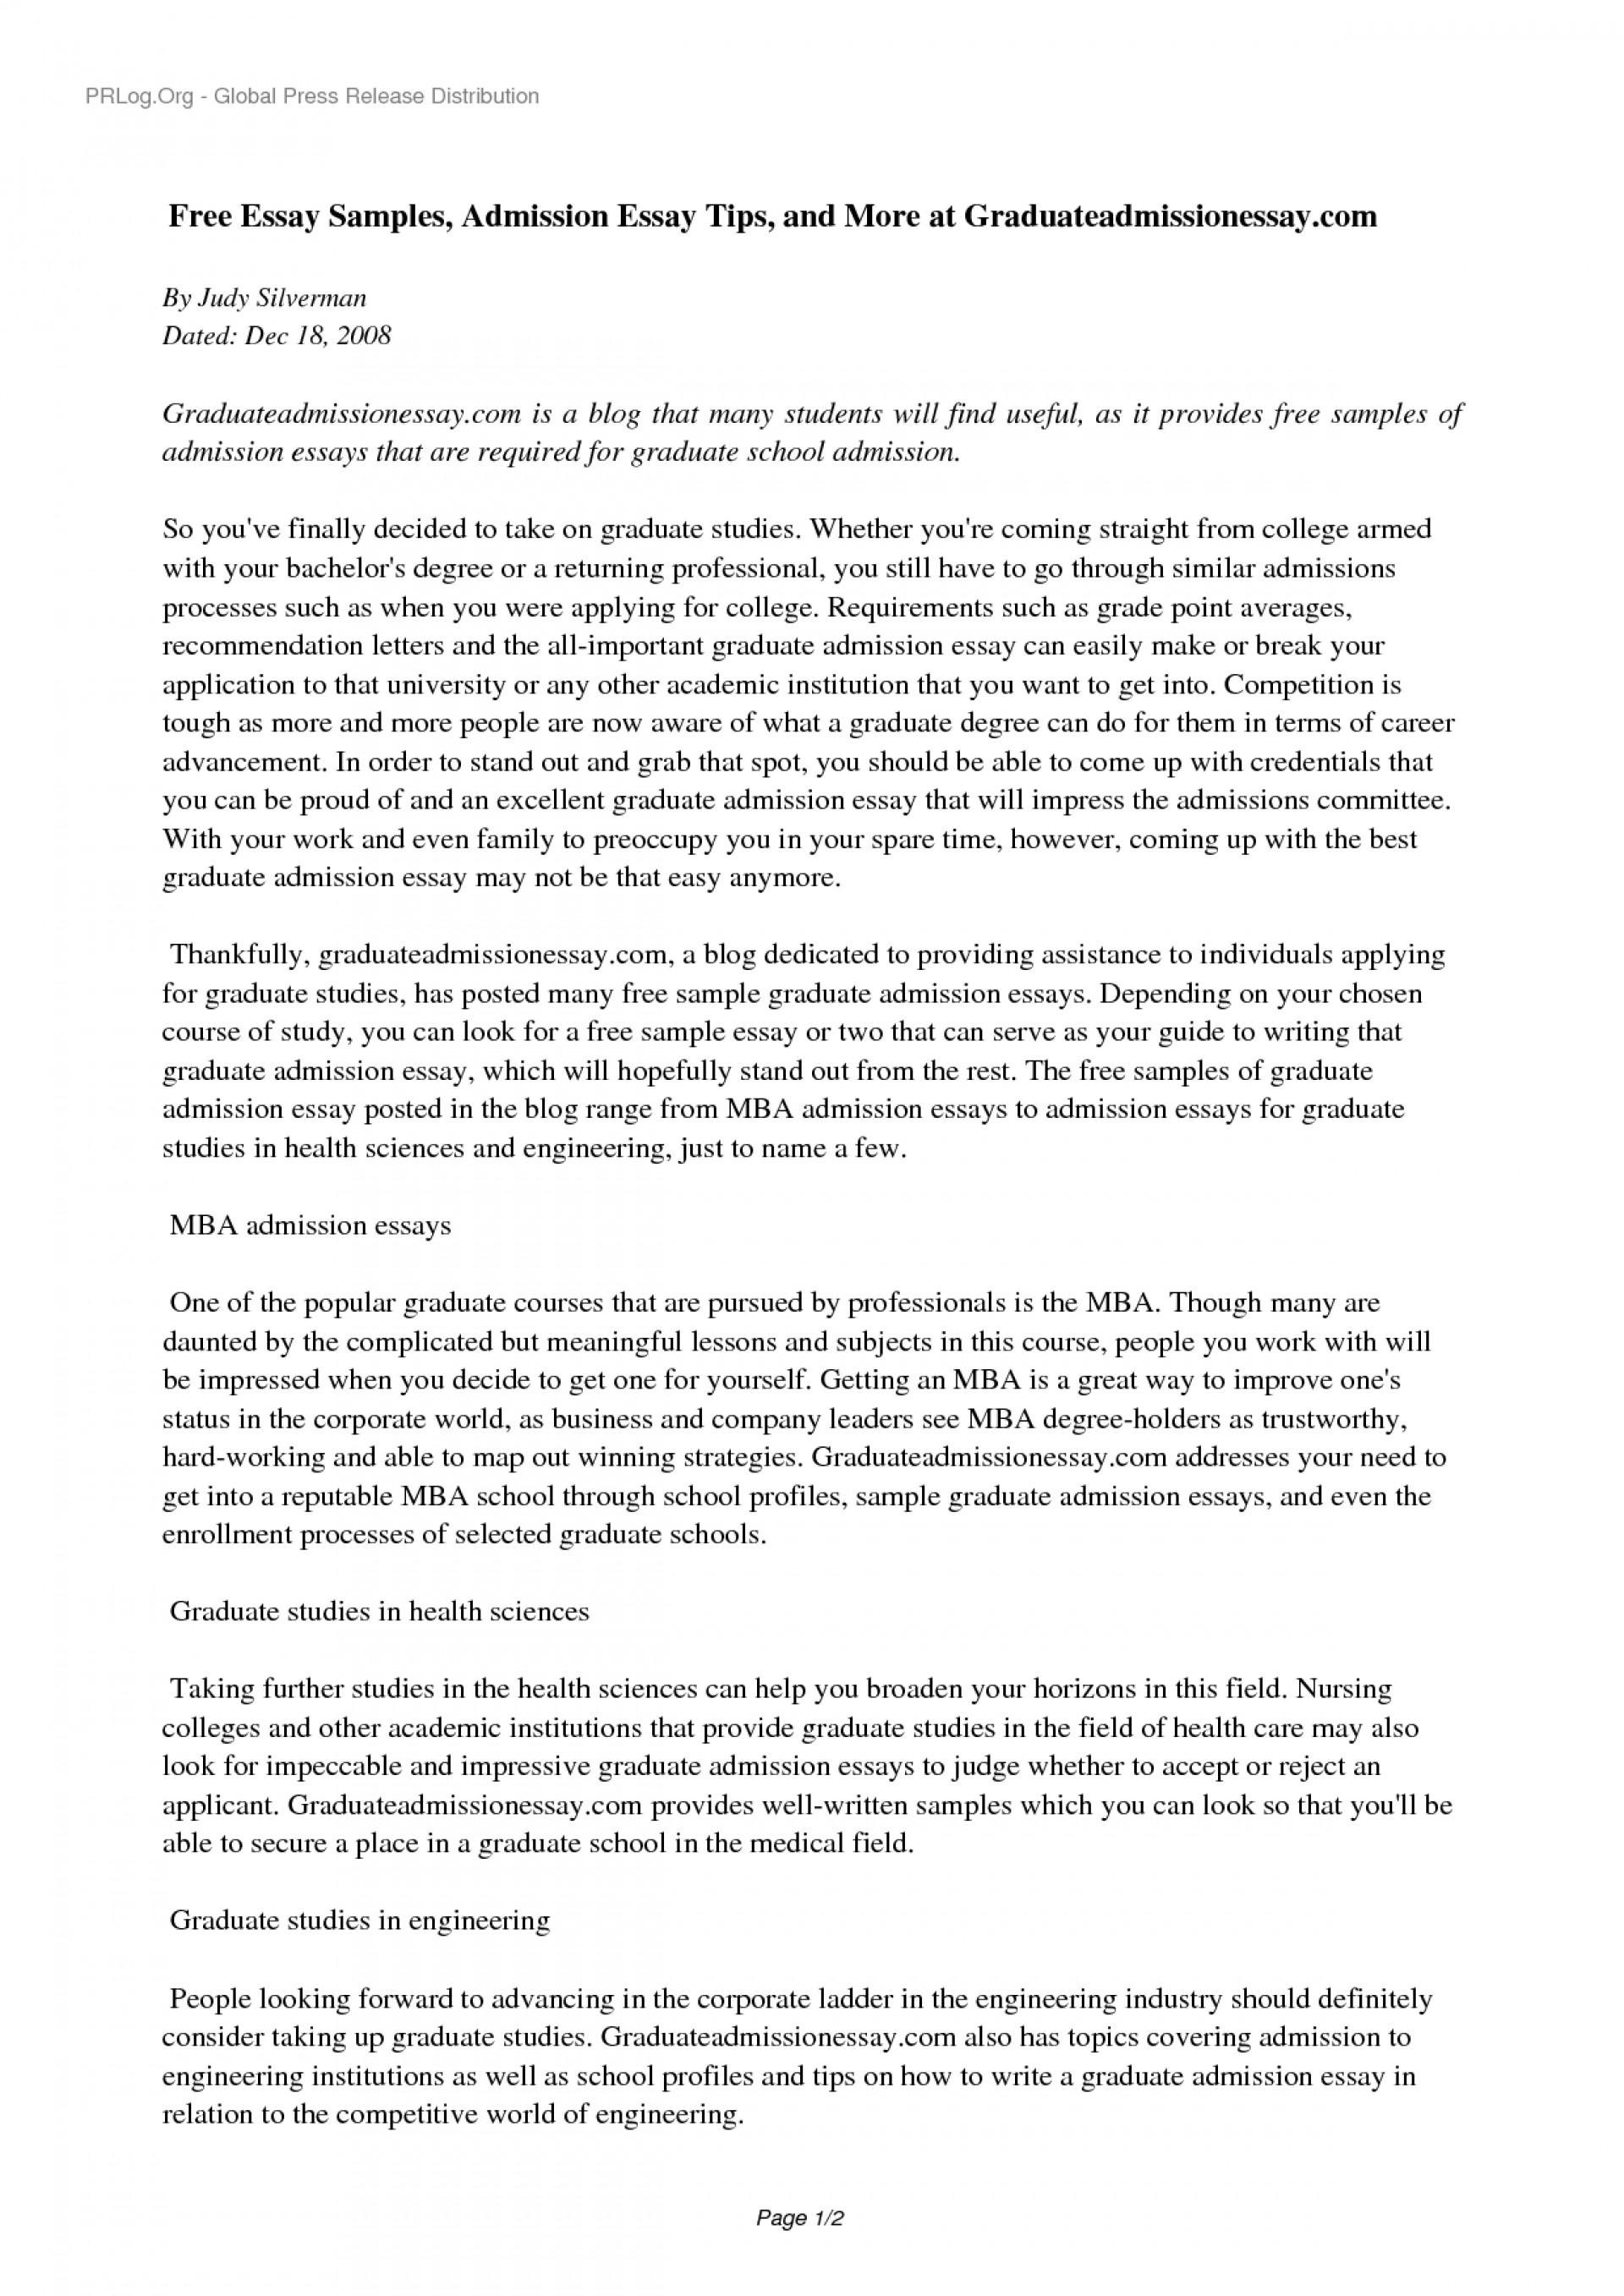 Federalism Essay Paper  Proposal Essay Topic List also Proposal Essay Topic List Impressive High School Application Essay  Thatsnotus Proposal Essay Outline